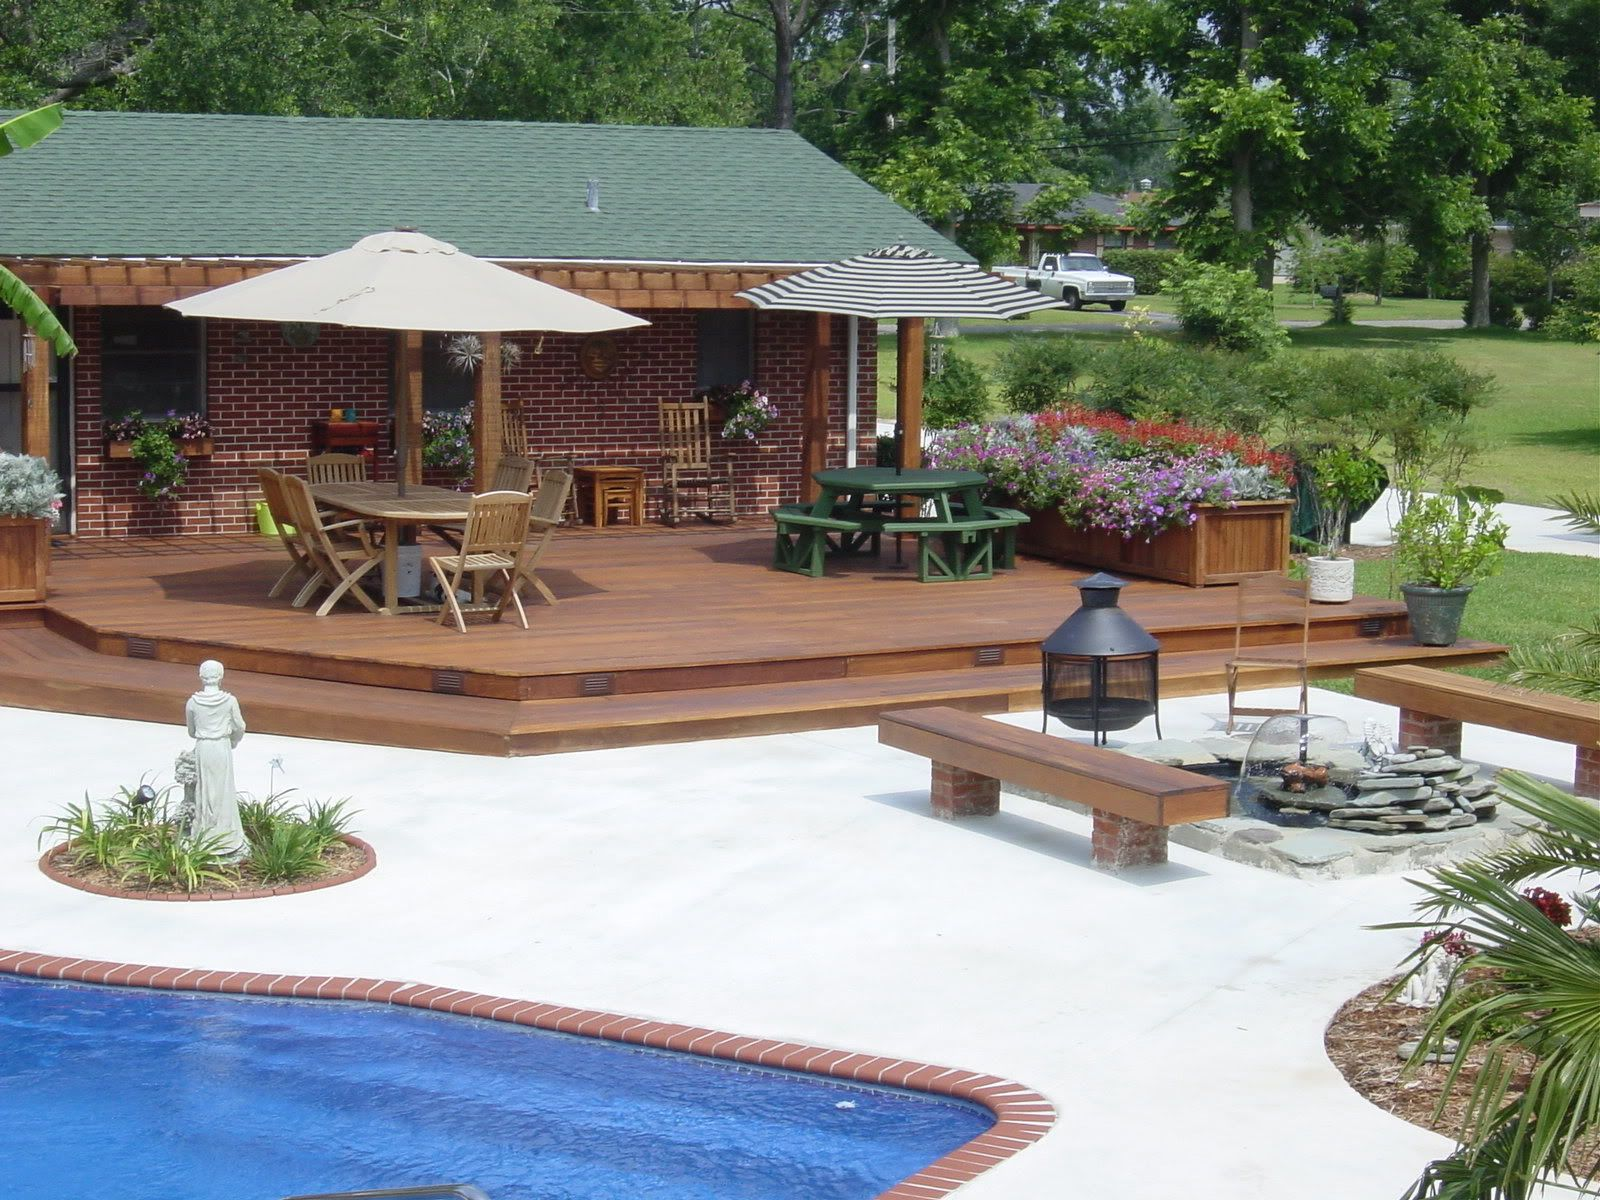 Cabana Pool Paver Patio Under Romanesque Style Open Cabana Adjacent